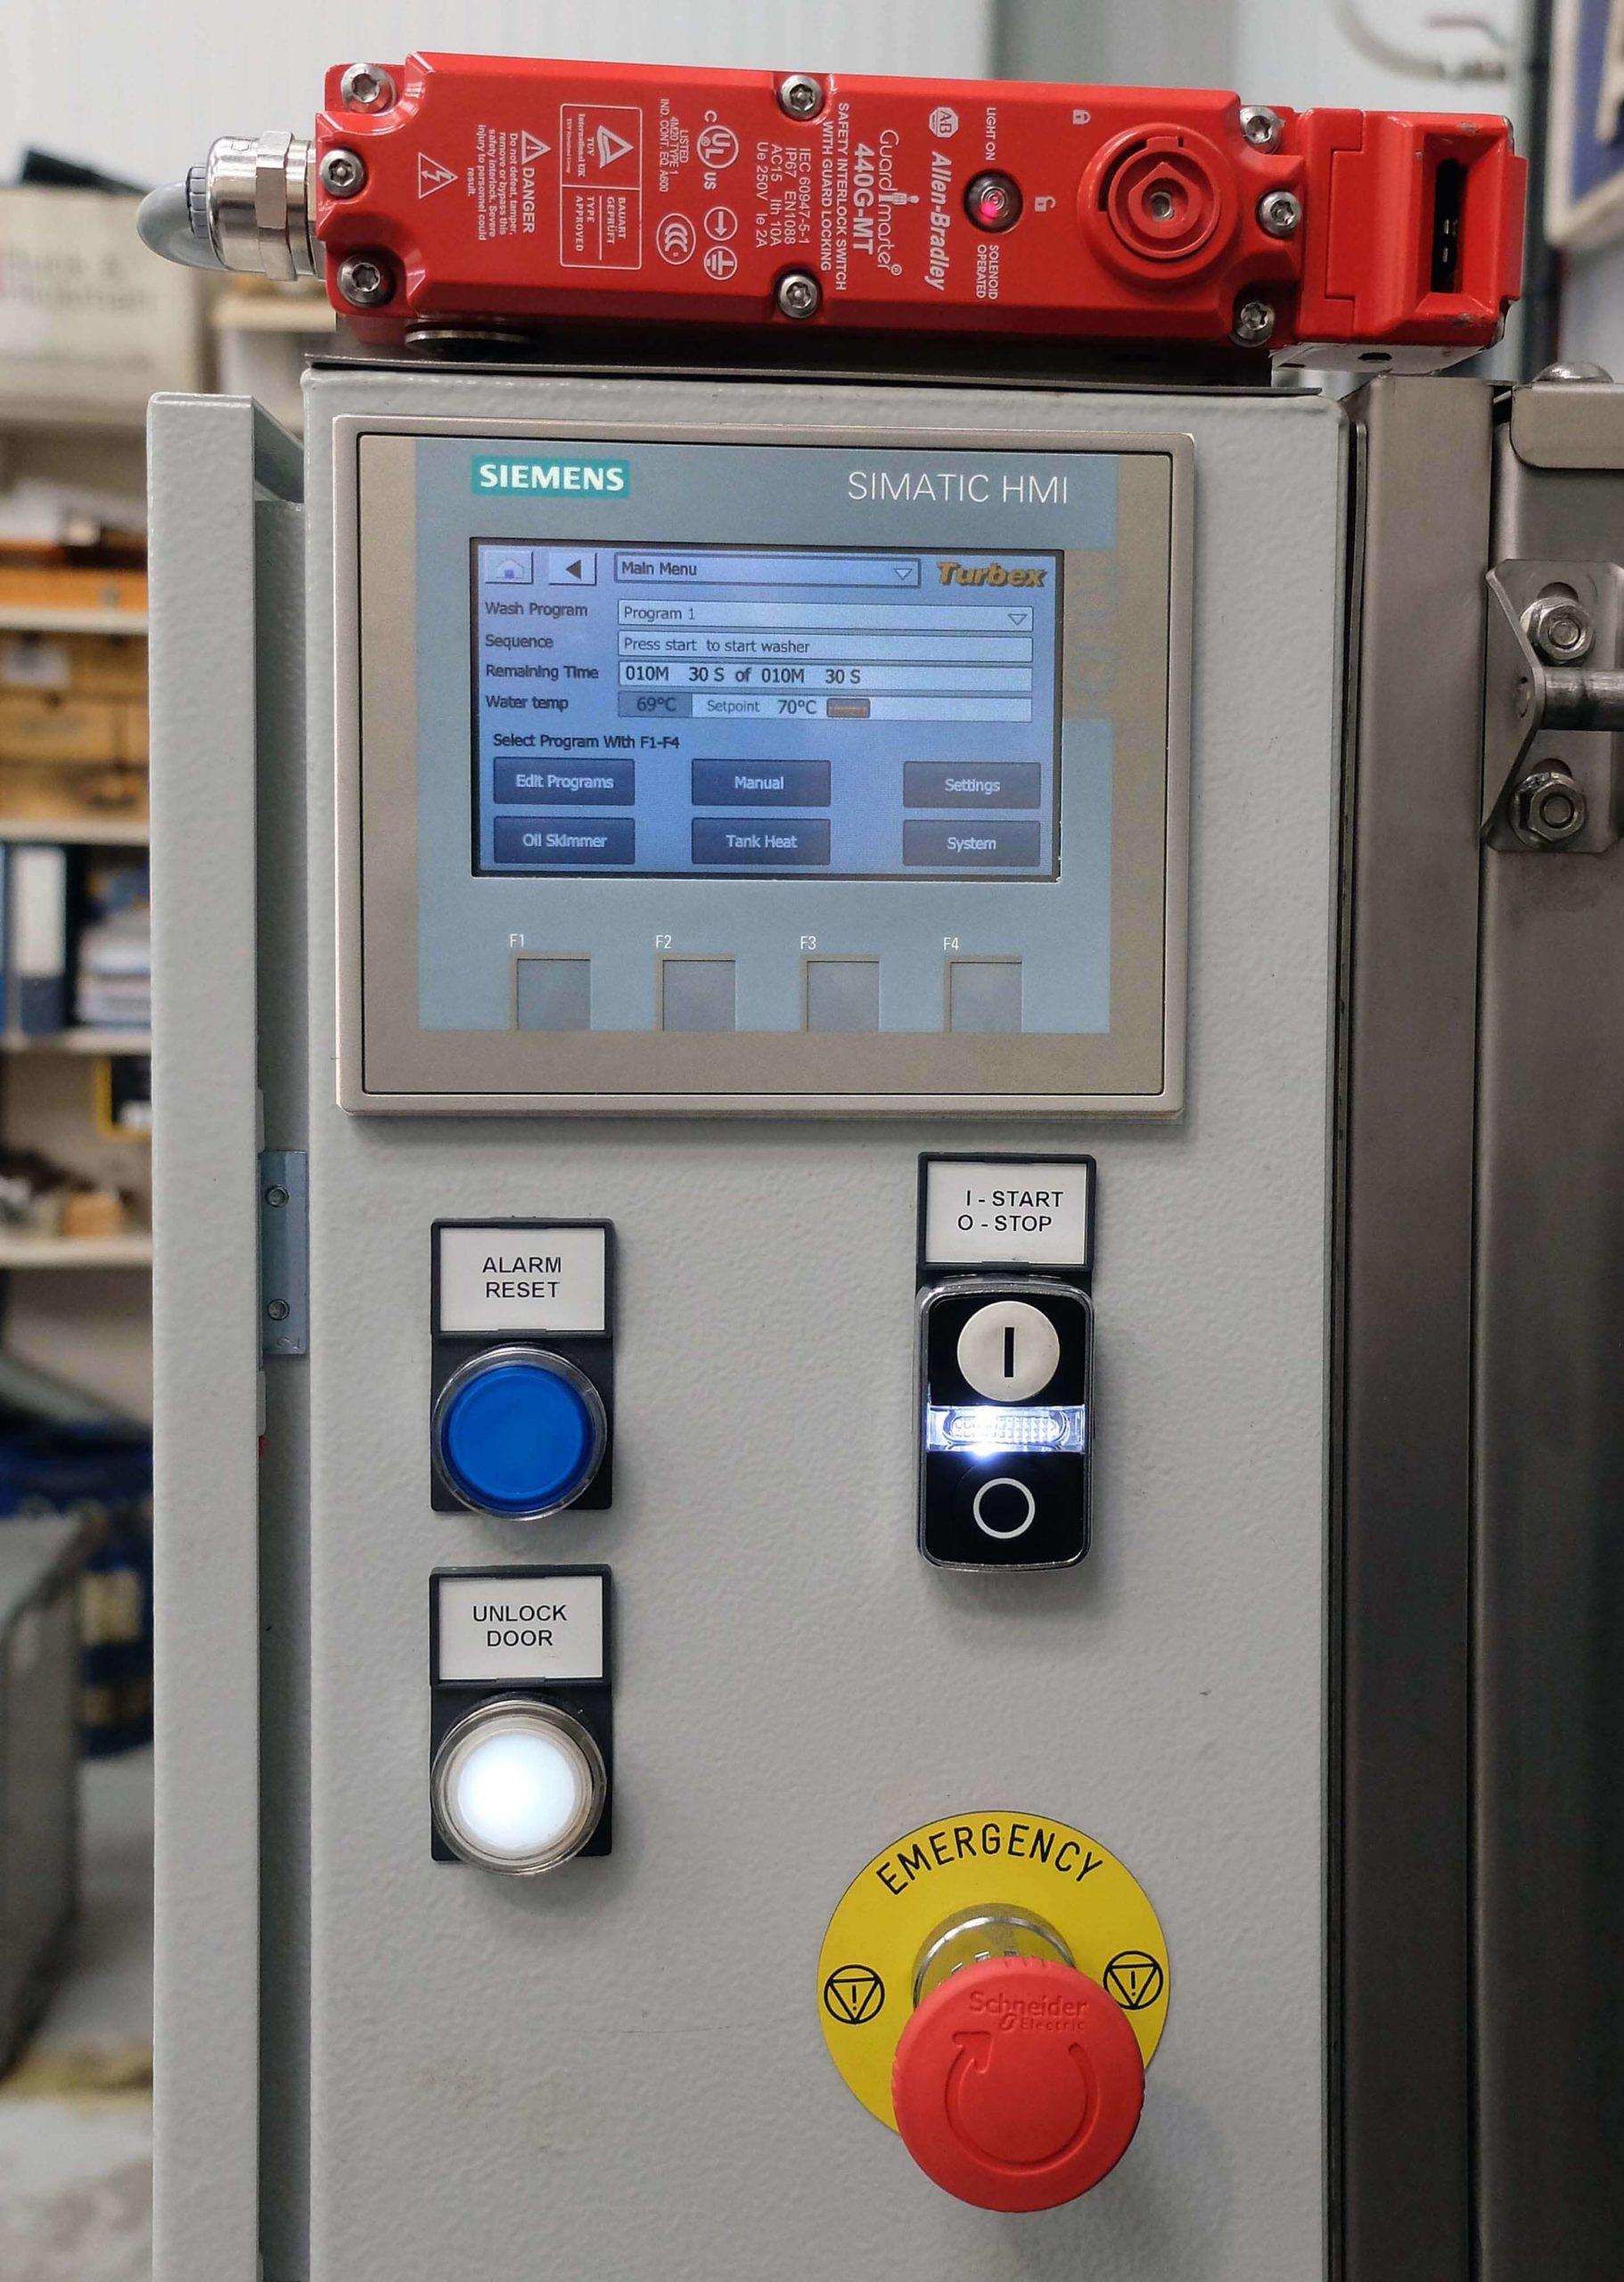 The control panel of the Turbex spray wash machine.